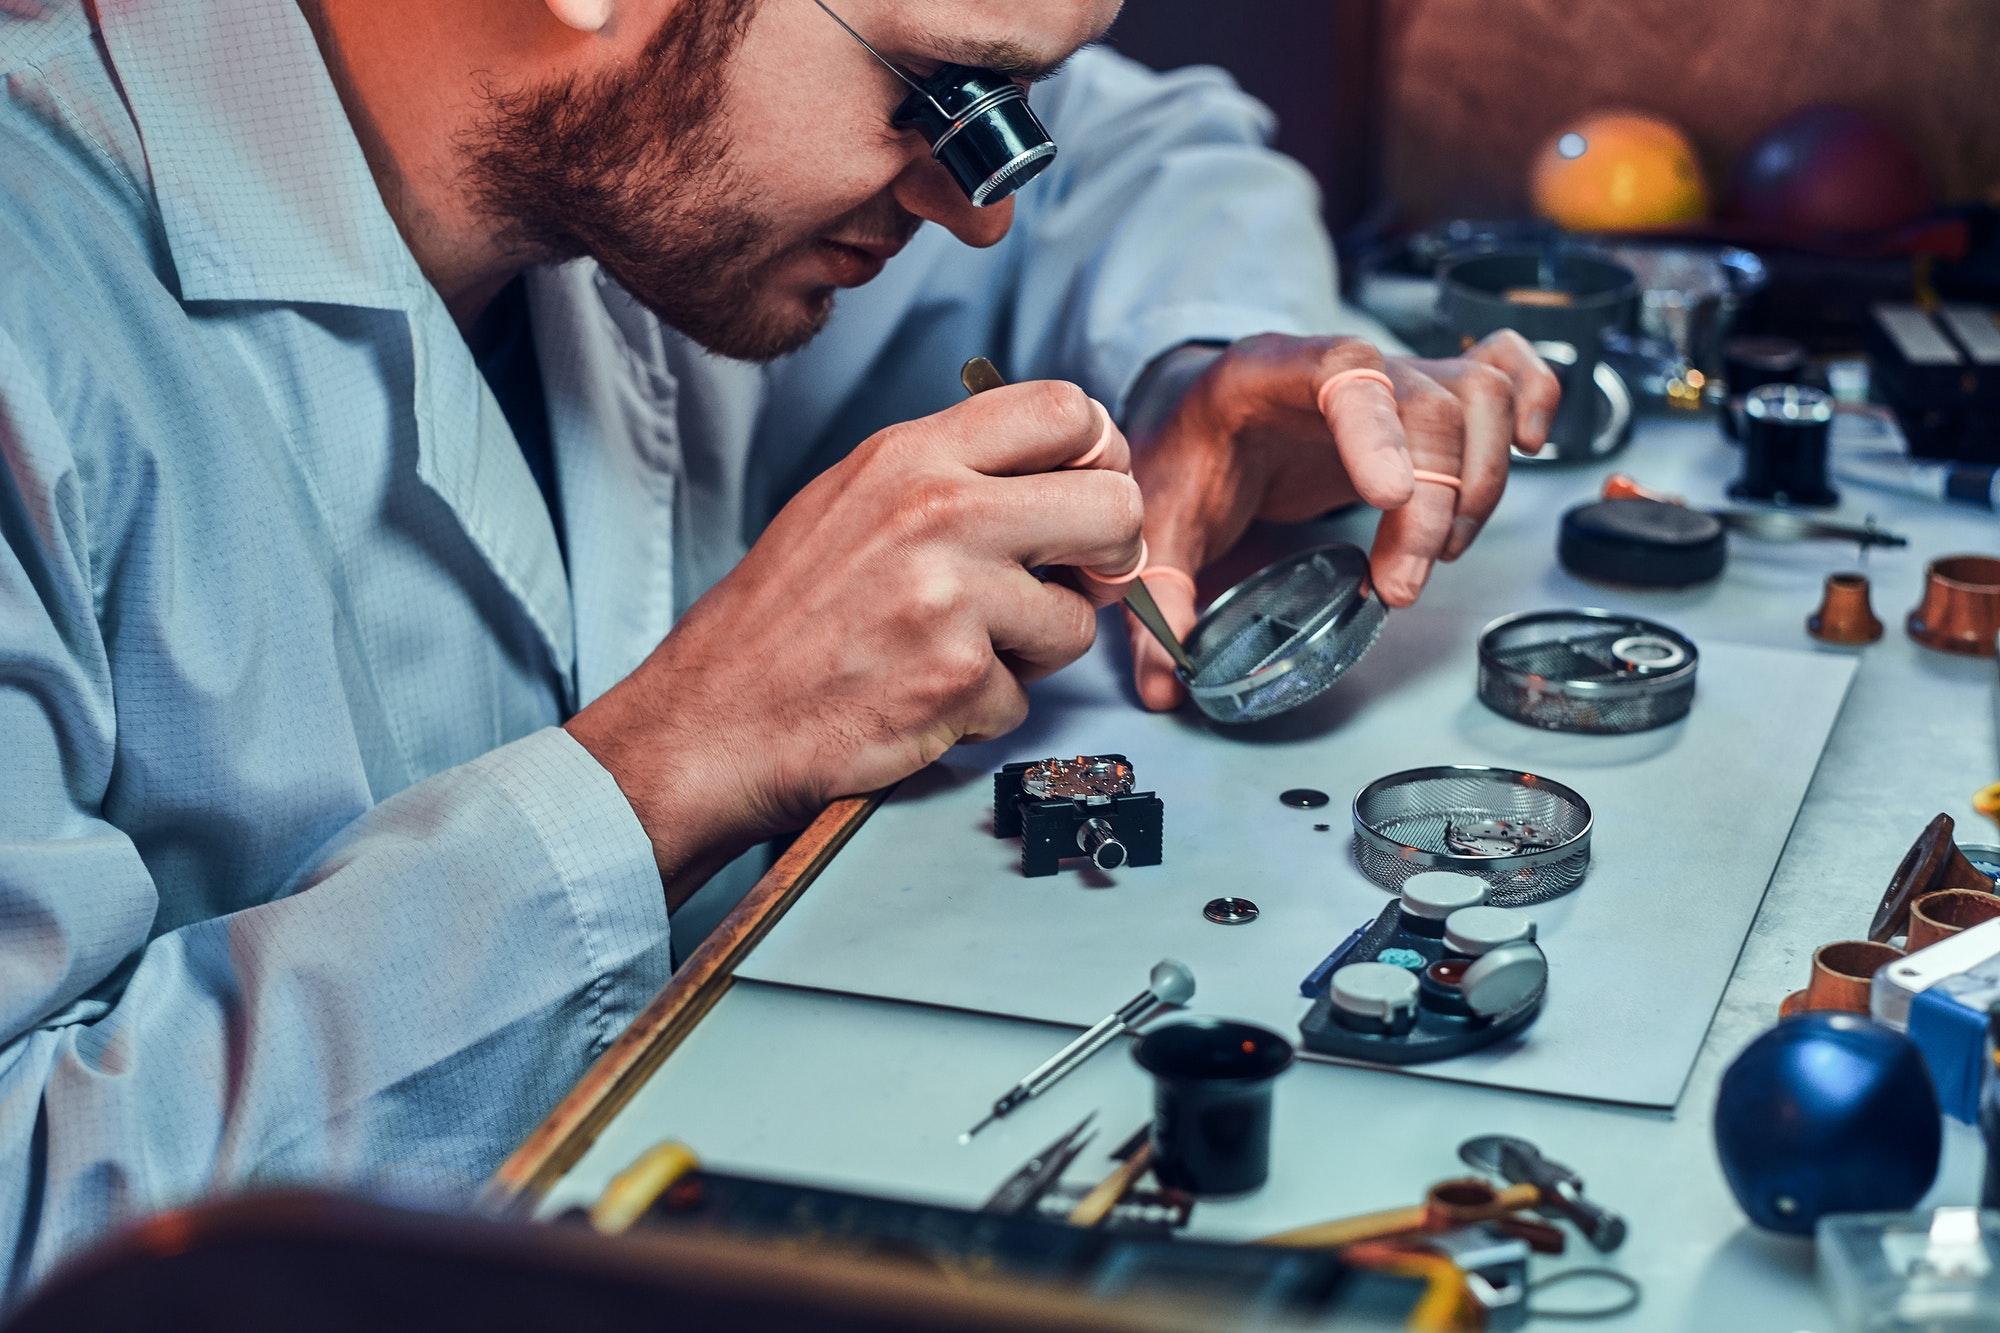 watch repair services in san antonio